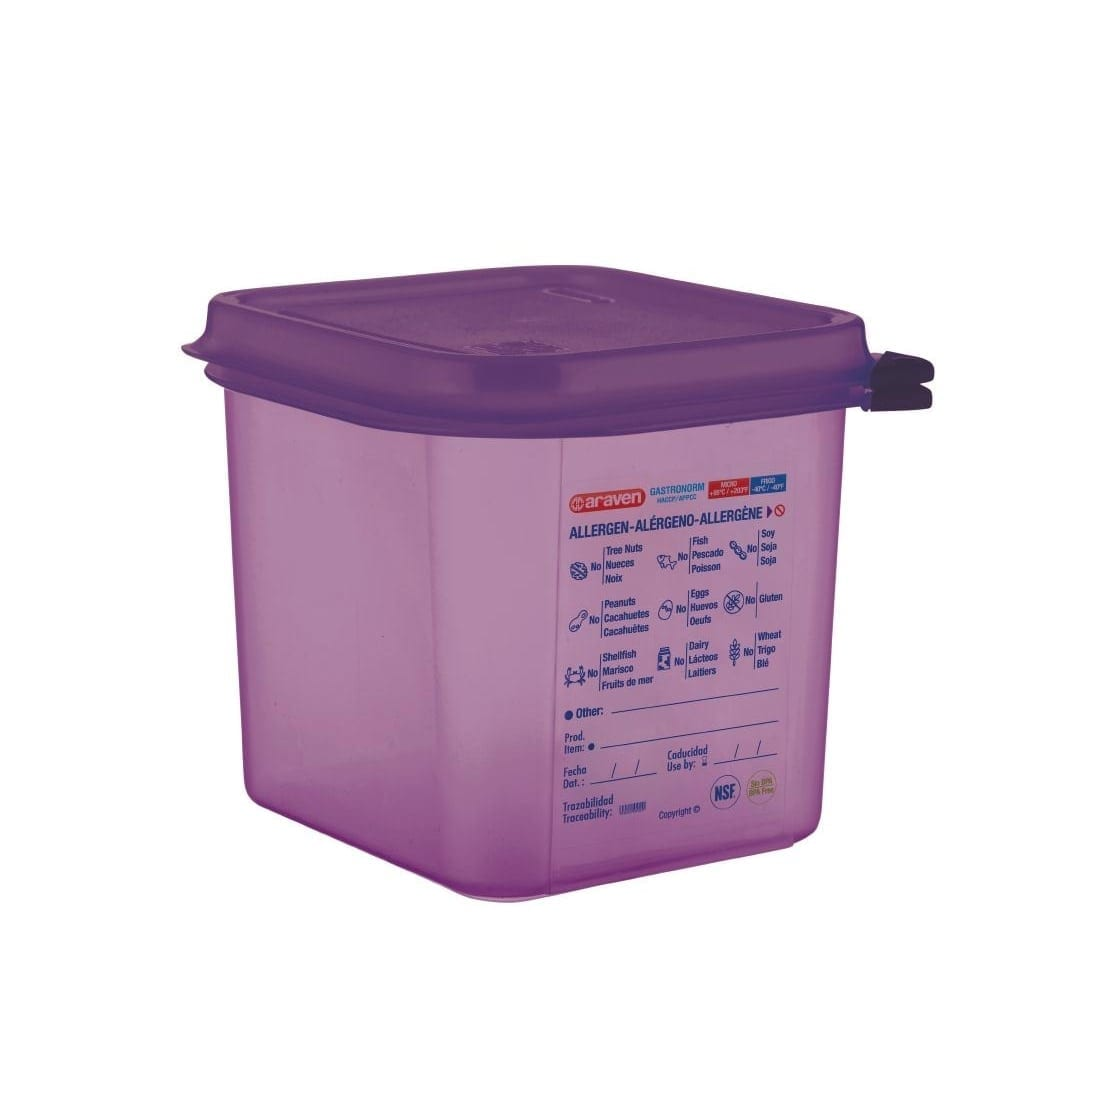 Araven Allergen Container GN - 1/6 2.6Ltr & Airtight Lid-0